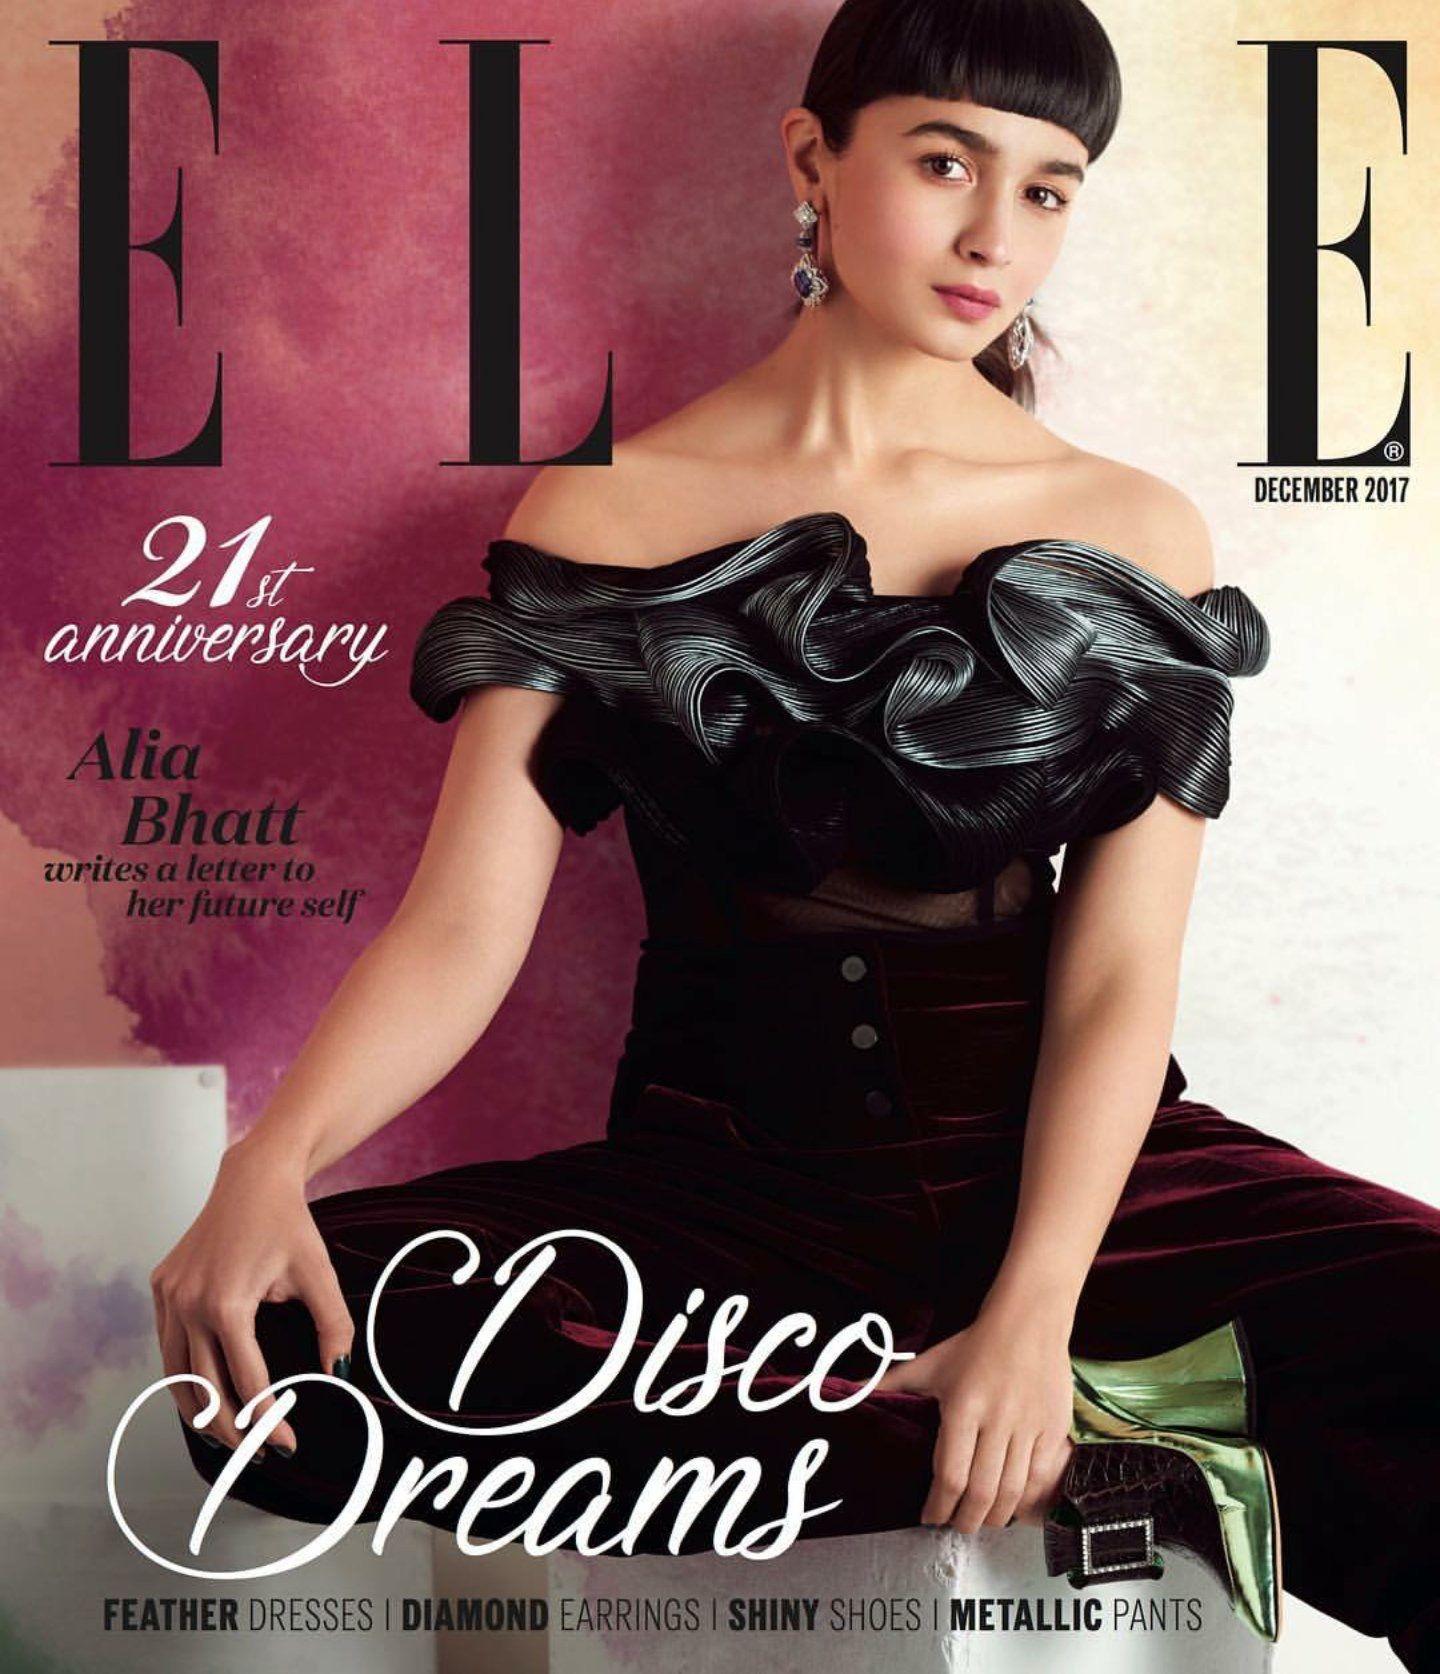 2019 year look- Alia newbie bhatt on vogue cover